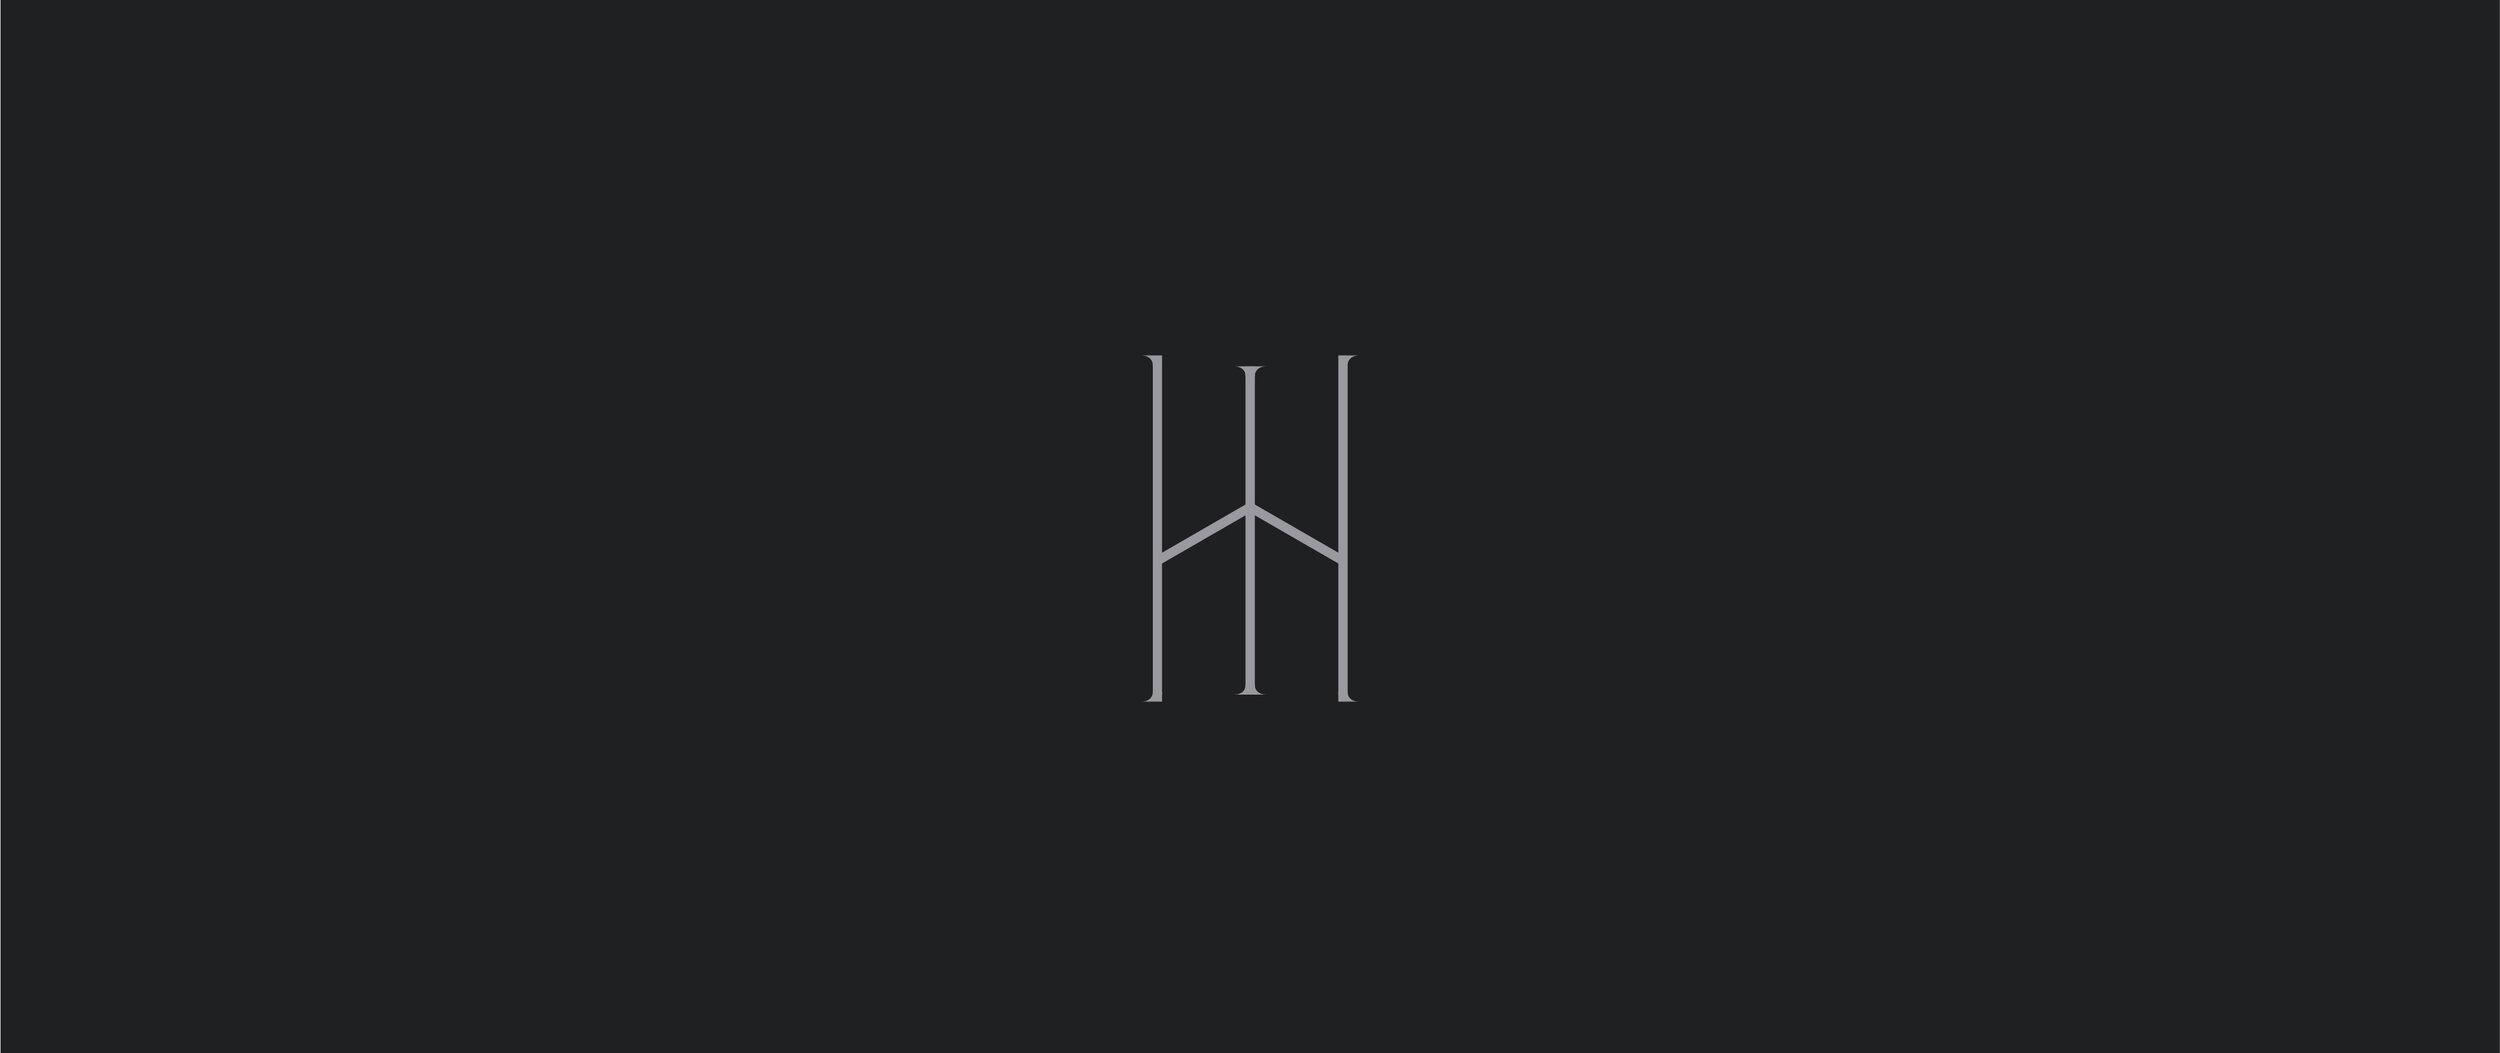 H&Hlogo_final-03 copy.jpg